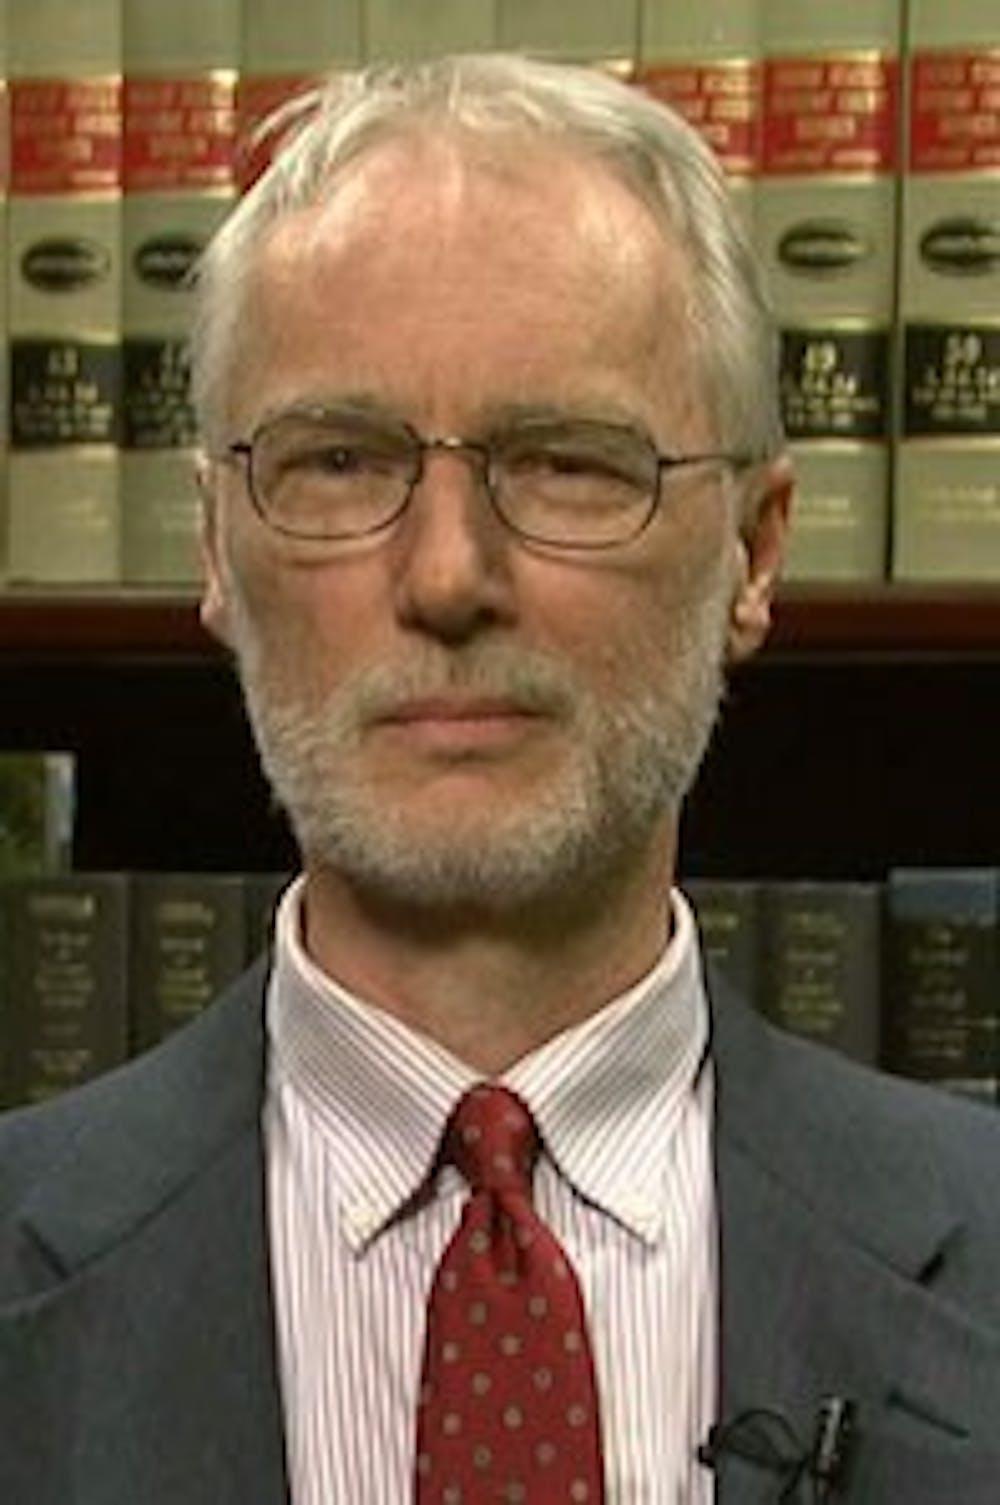 Q&A with UNC professor Gerald Cecil